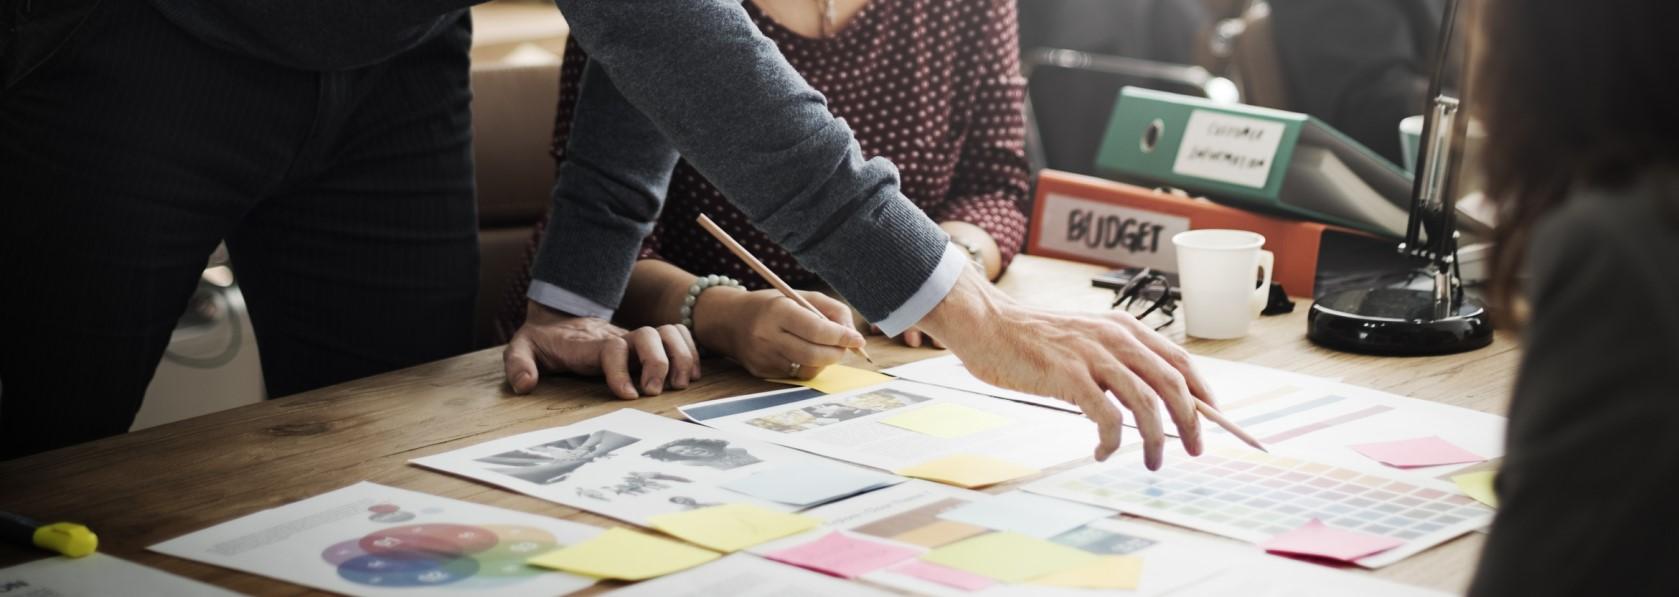 Strategische PR-Planung & Mediaberatung